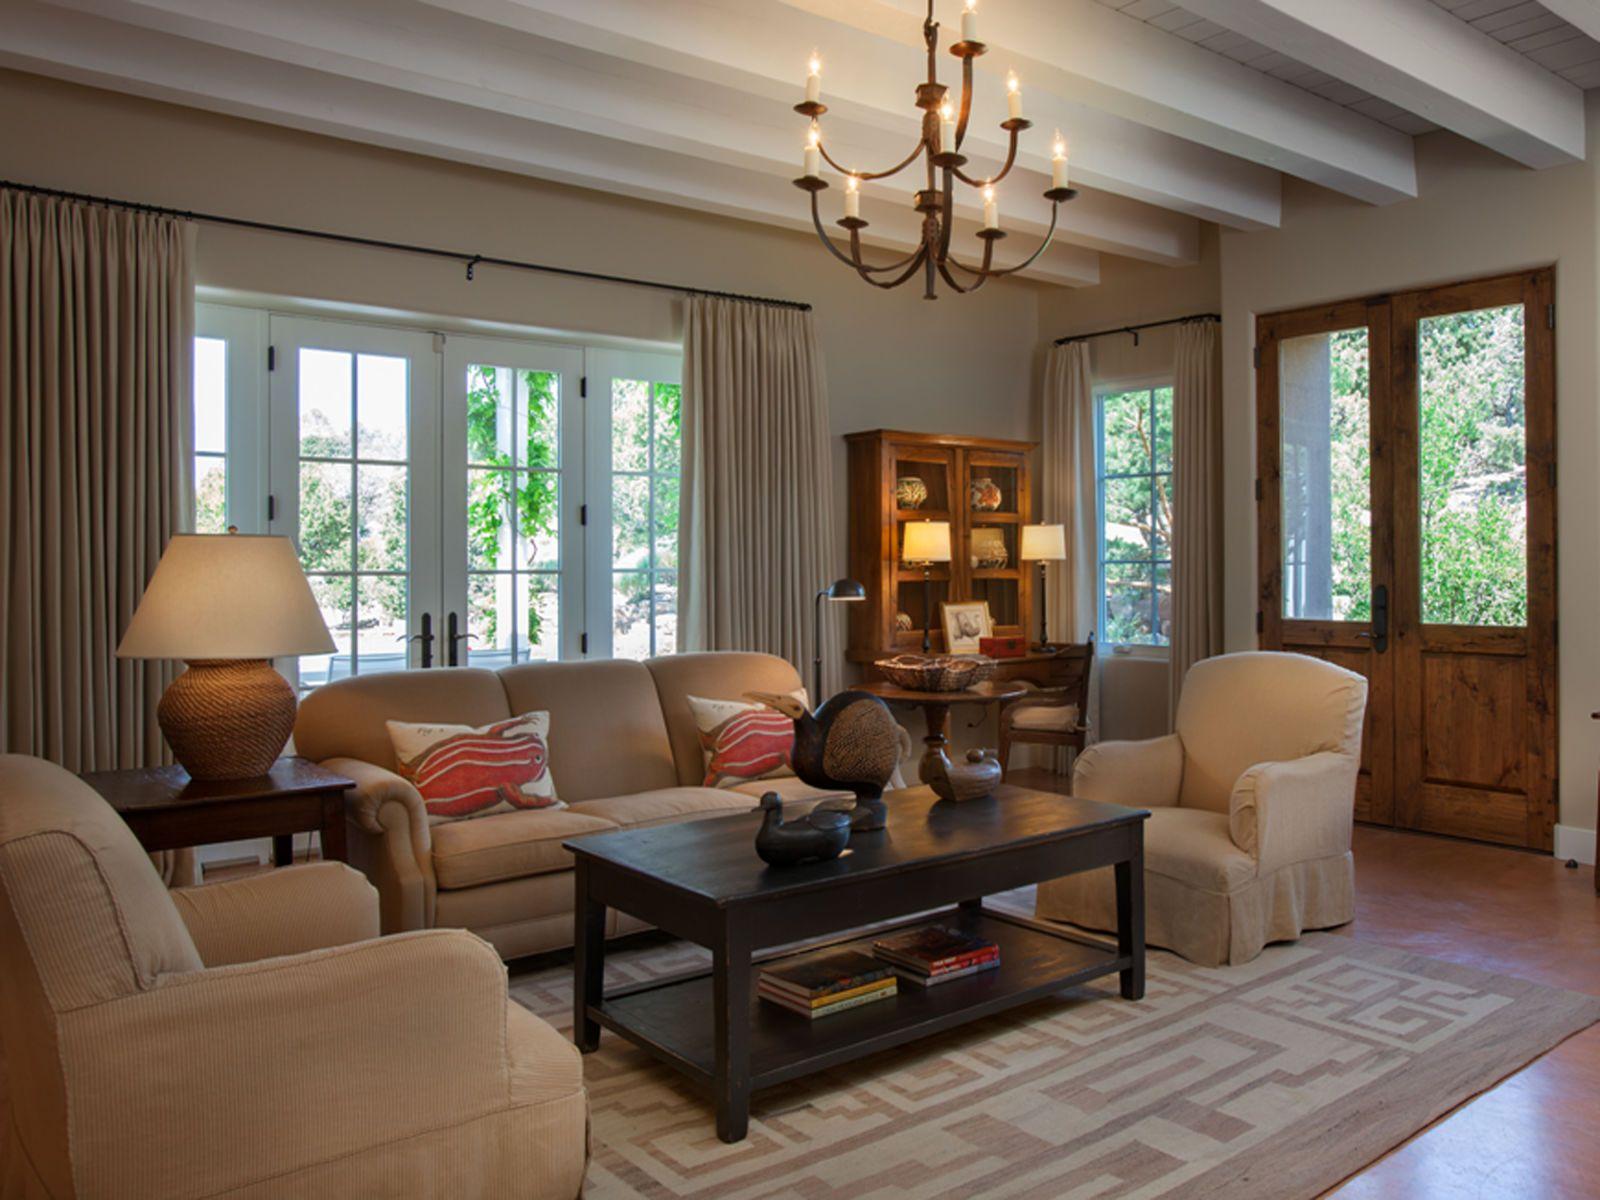 Step Inside A Stunning Adobe Home In Santa Fe Adobe House House Interior Home